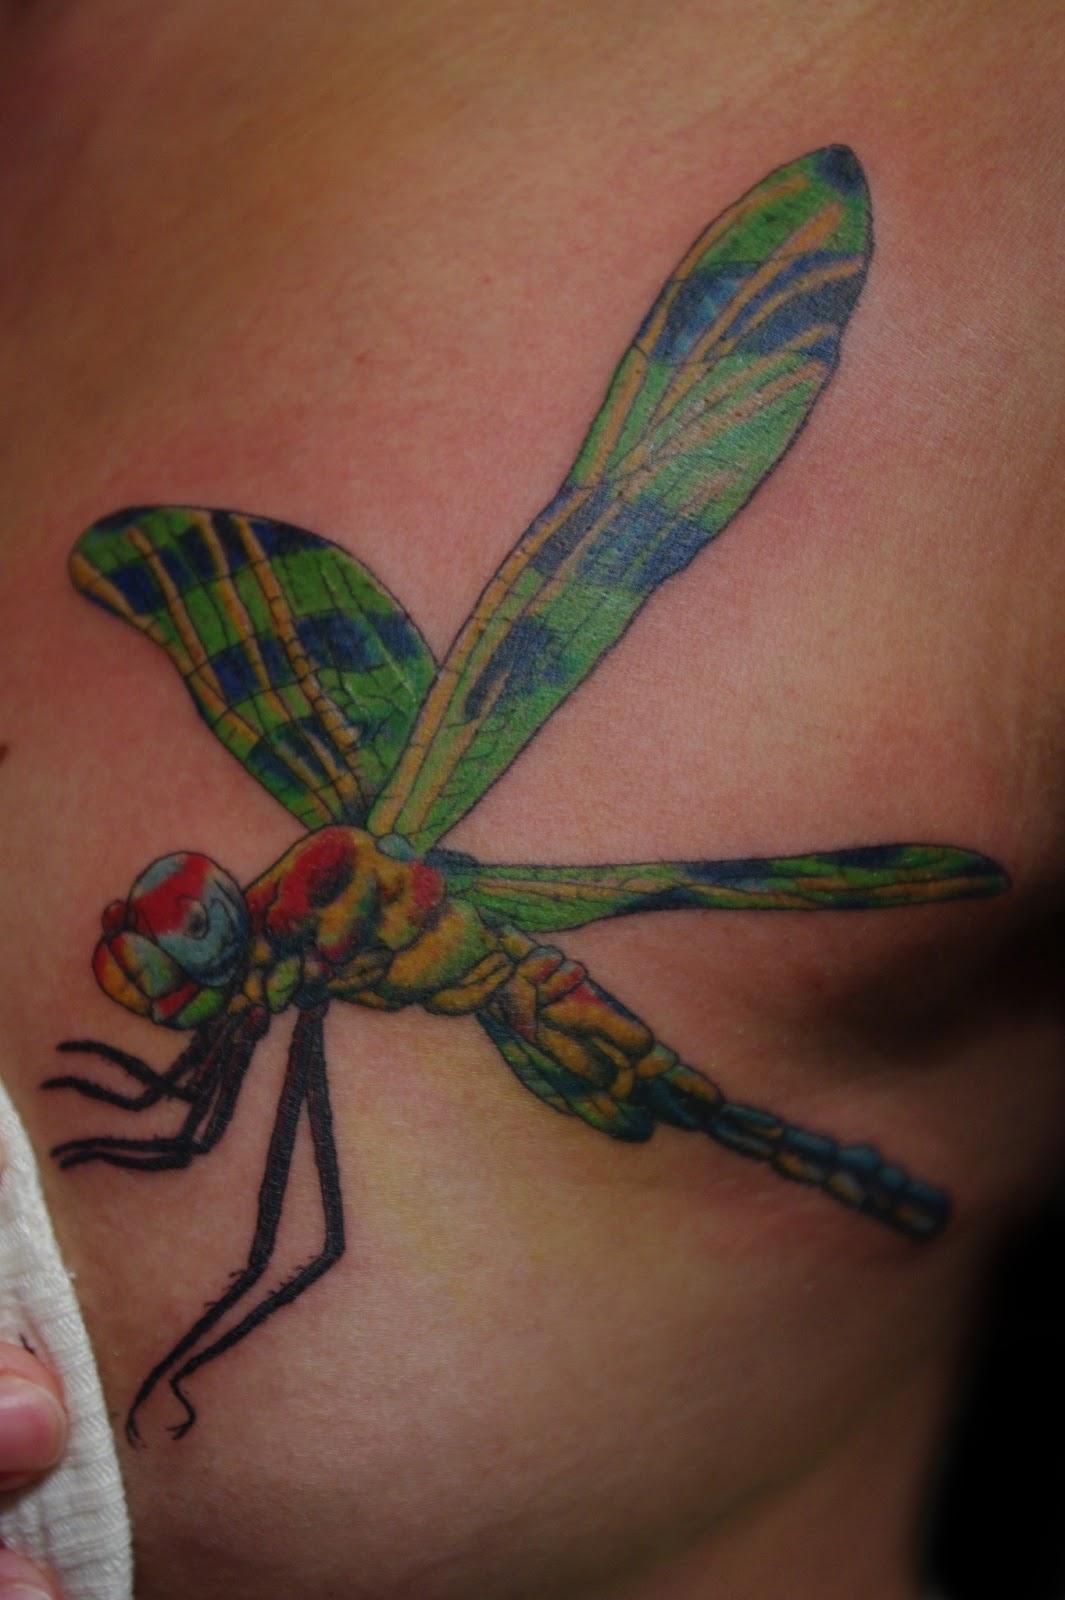 Realistic Dragonfly Tattoos Soul Inn House Tattoo:...